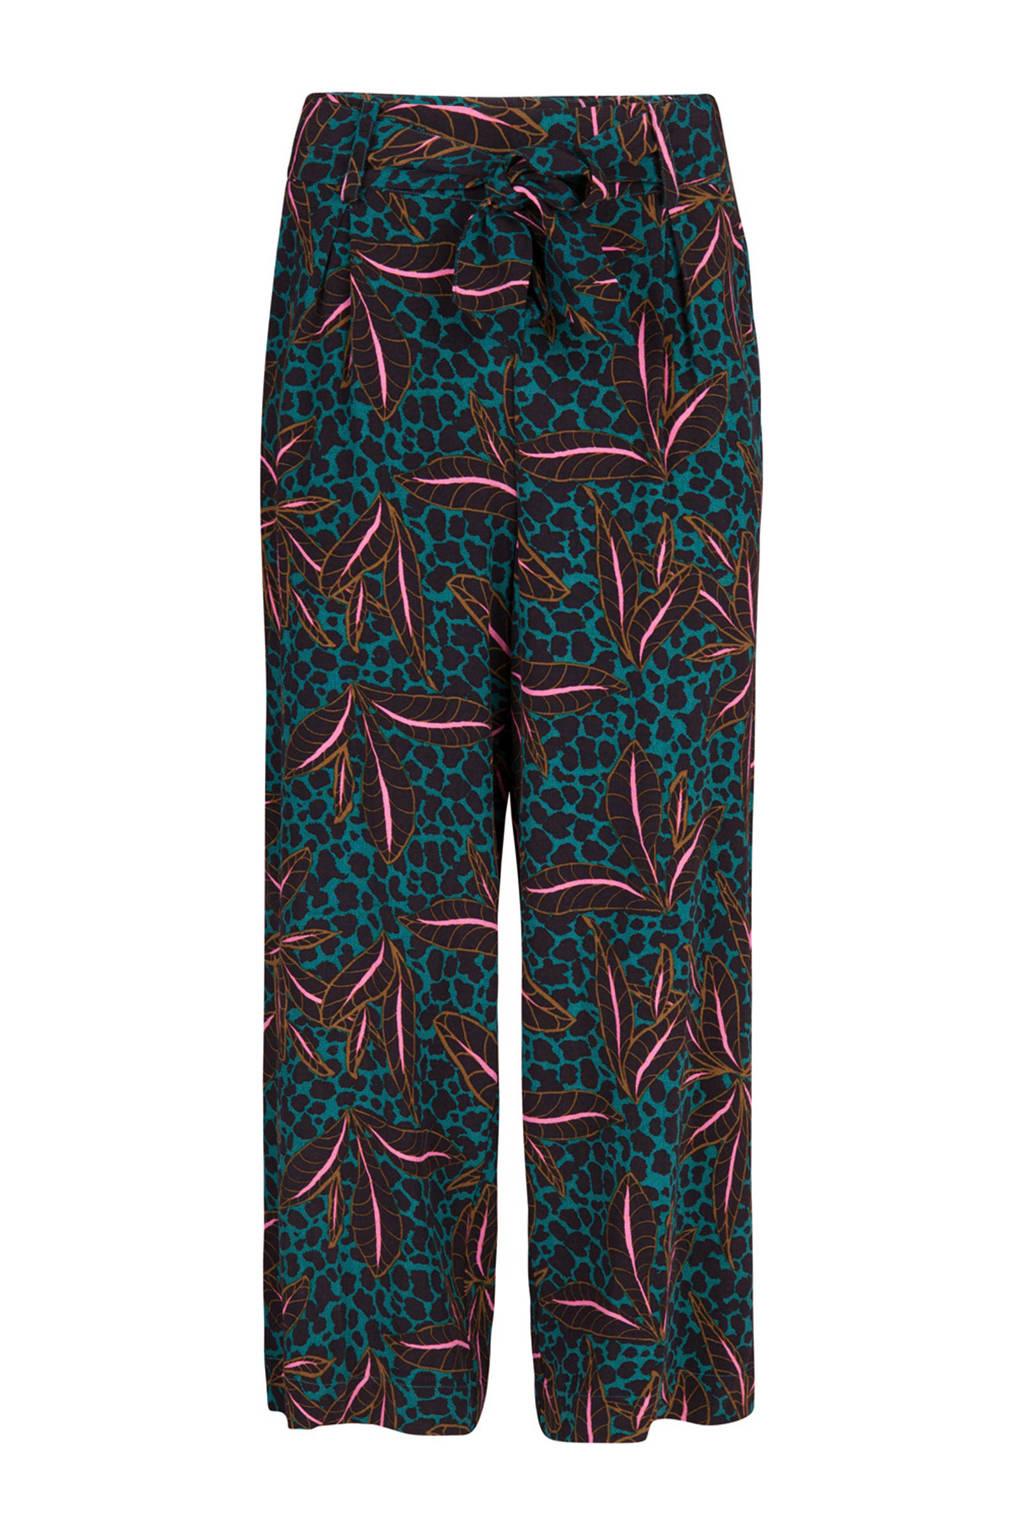 WE Fashion cropped loose fit broek met all over print multi, Multi